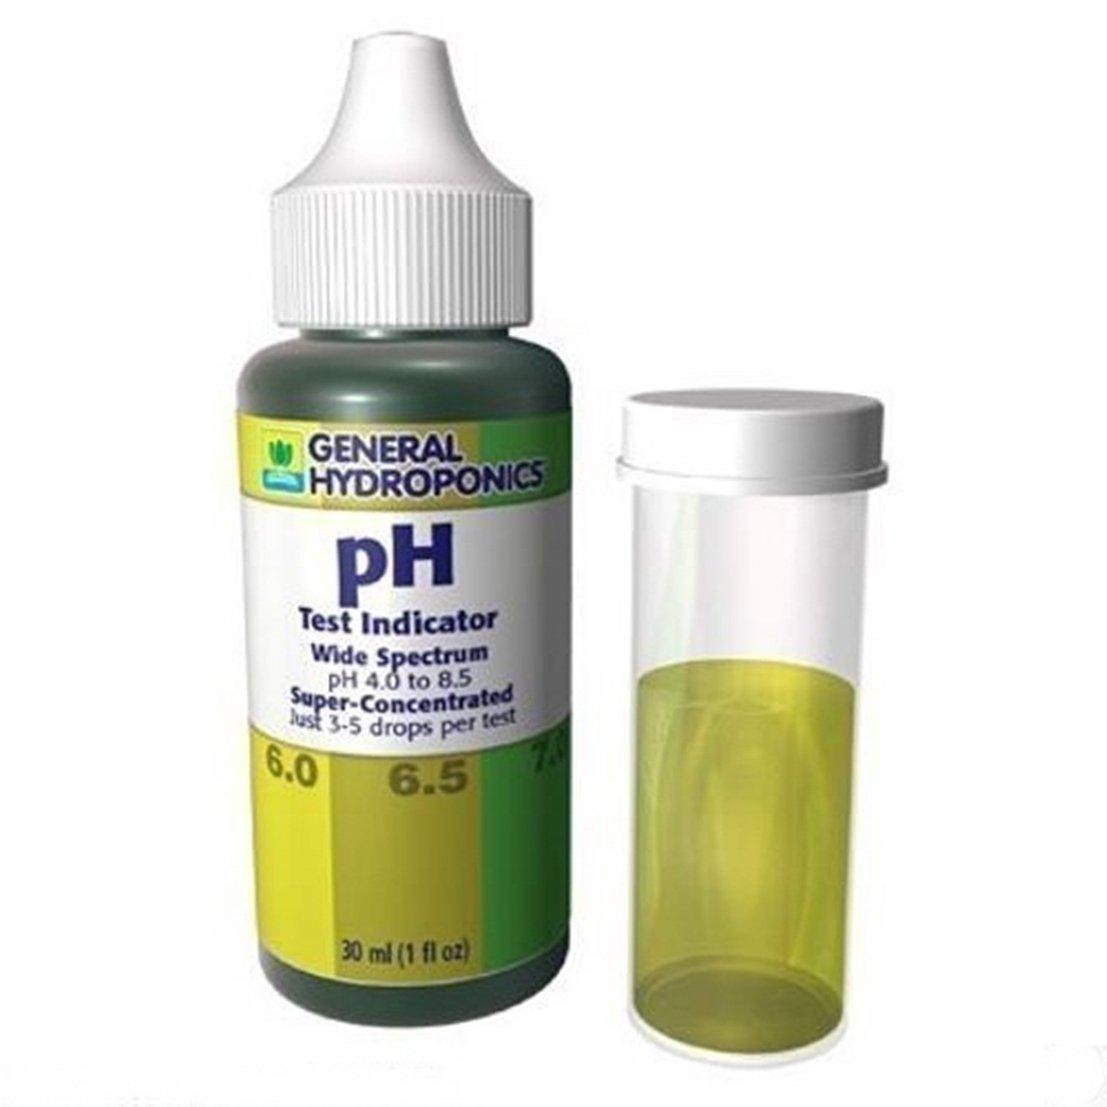 1 Set Super Popular General Hydroponics pH Test Kit Up and Down Control Indicator Tester Wide Spectrum Volume 30ml